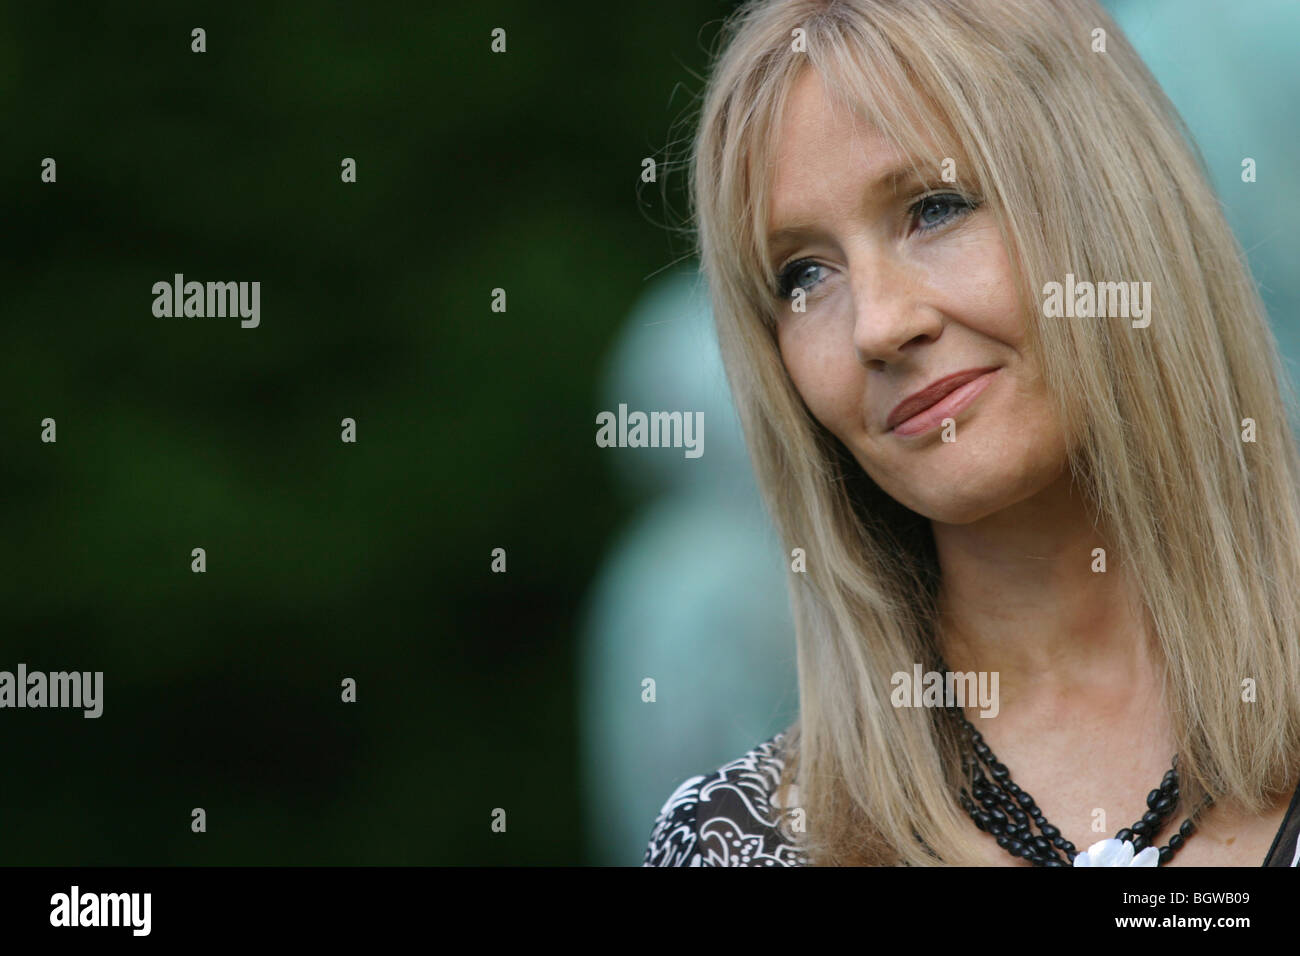 Joanne K. ( J.K.) Rowling, creator and author of Harry Potter series of children;s books, 2004 Edinburgh Book Festival, - Stock Image